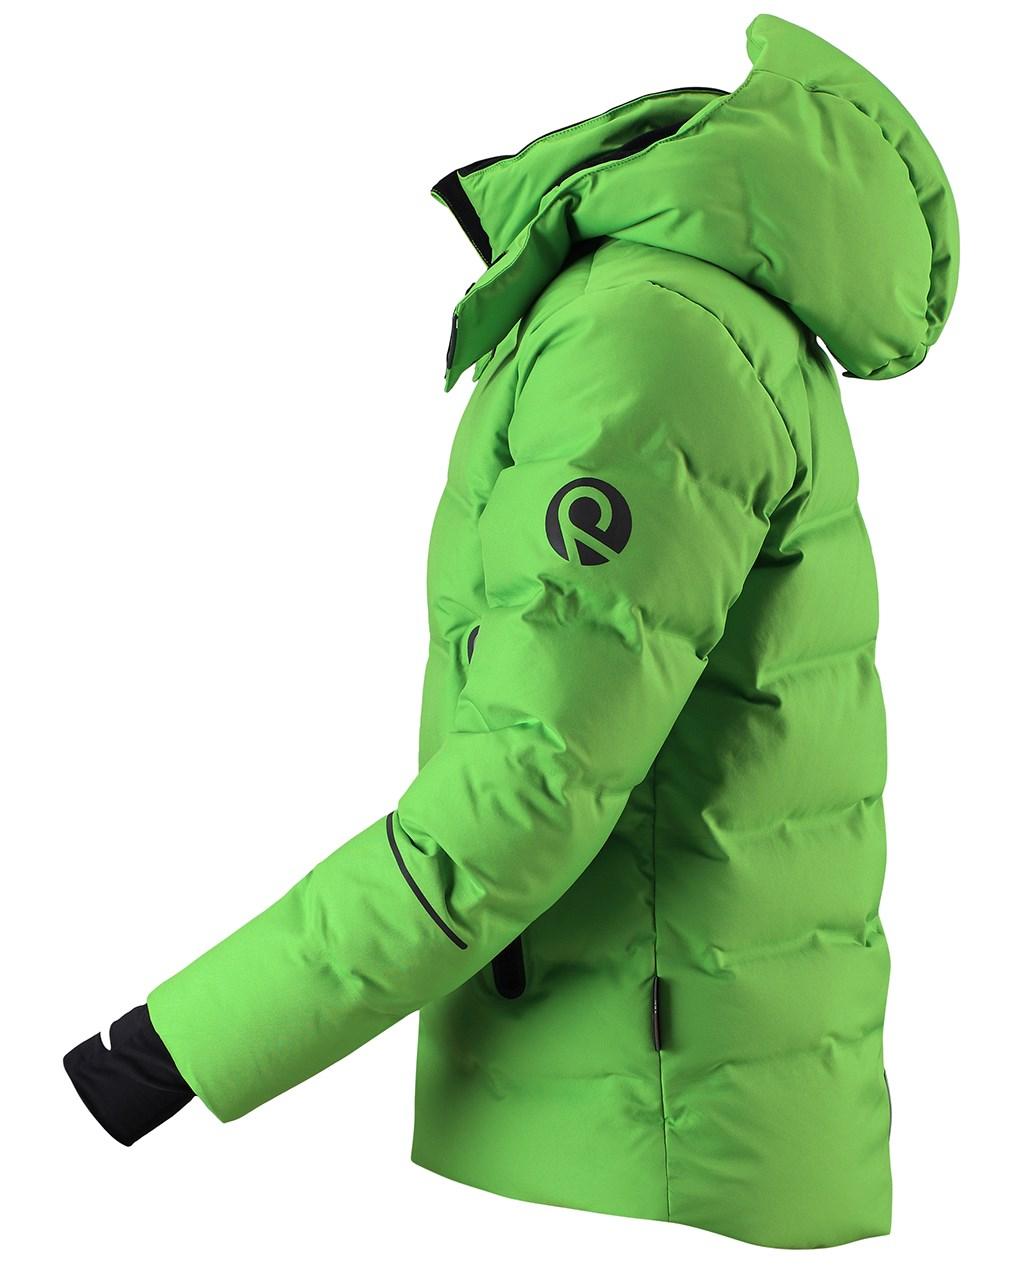 af9a0ec4b2f9 Down Jacket Wakeup JR Fresh Green